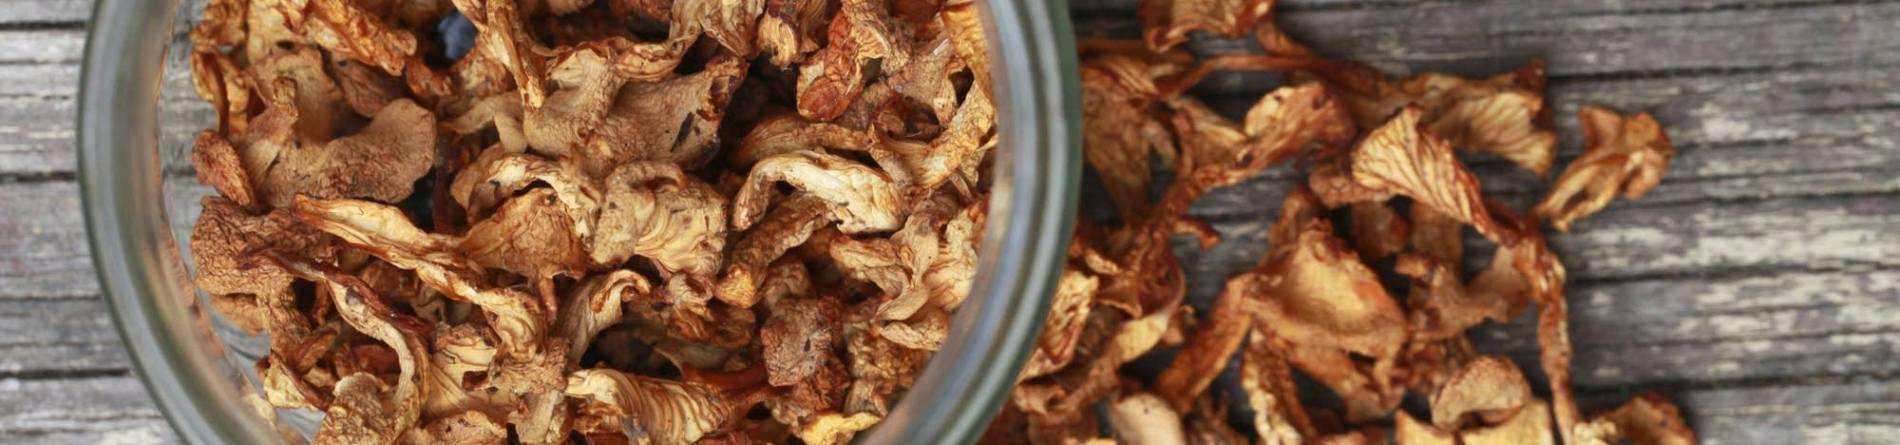 Types Of Dried Mushrooms